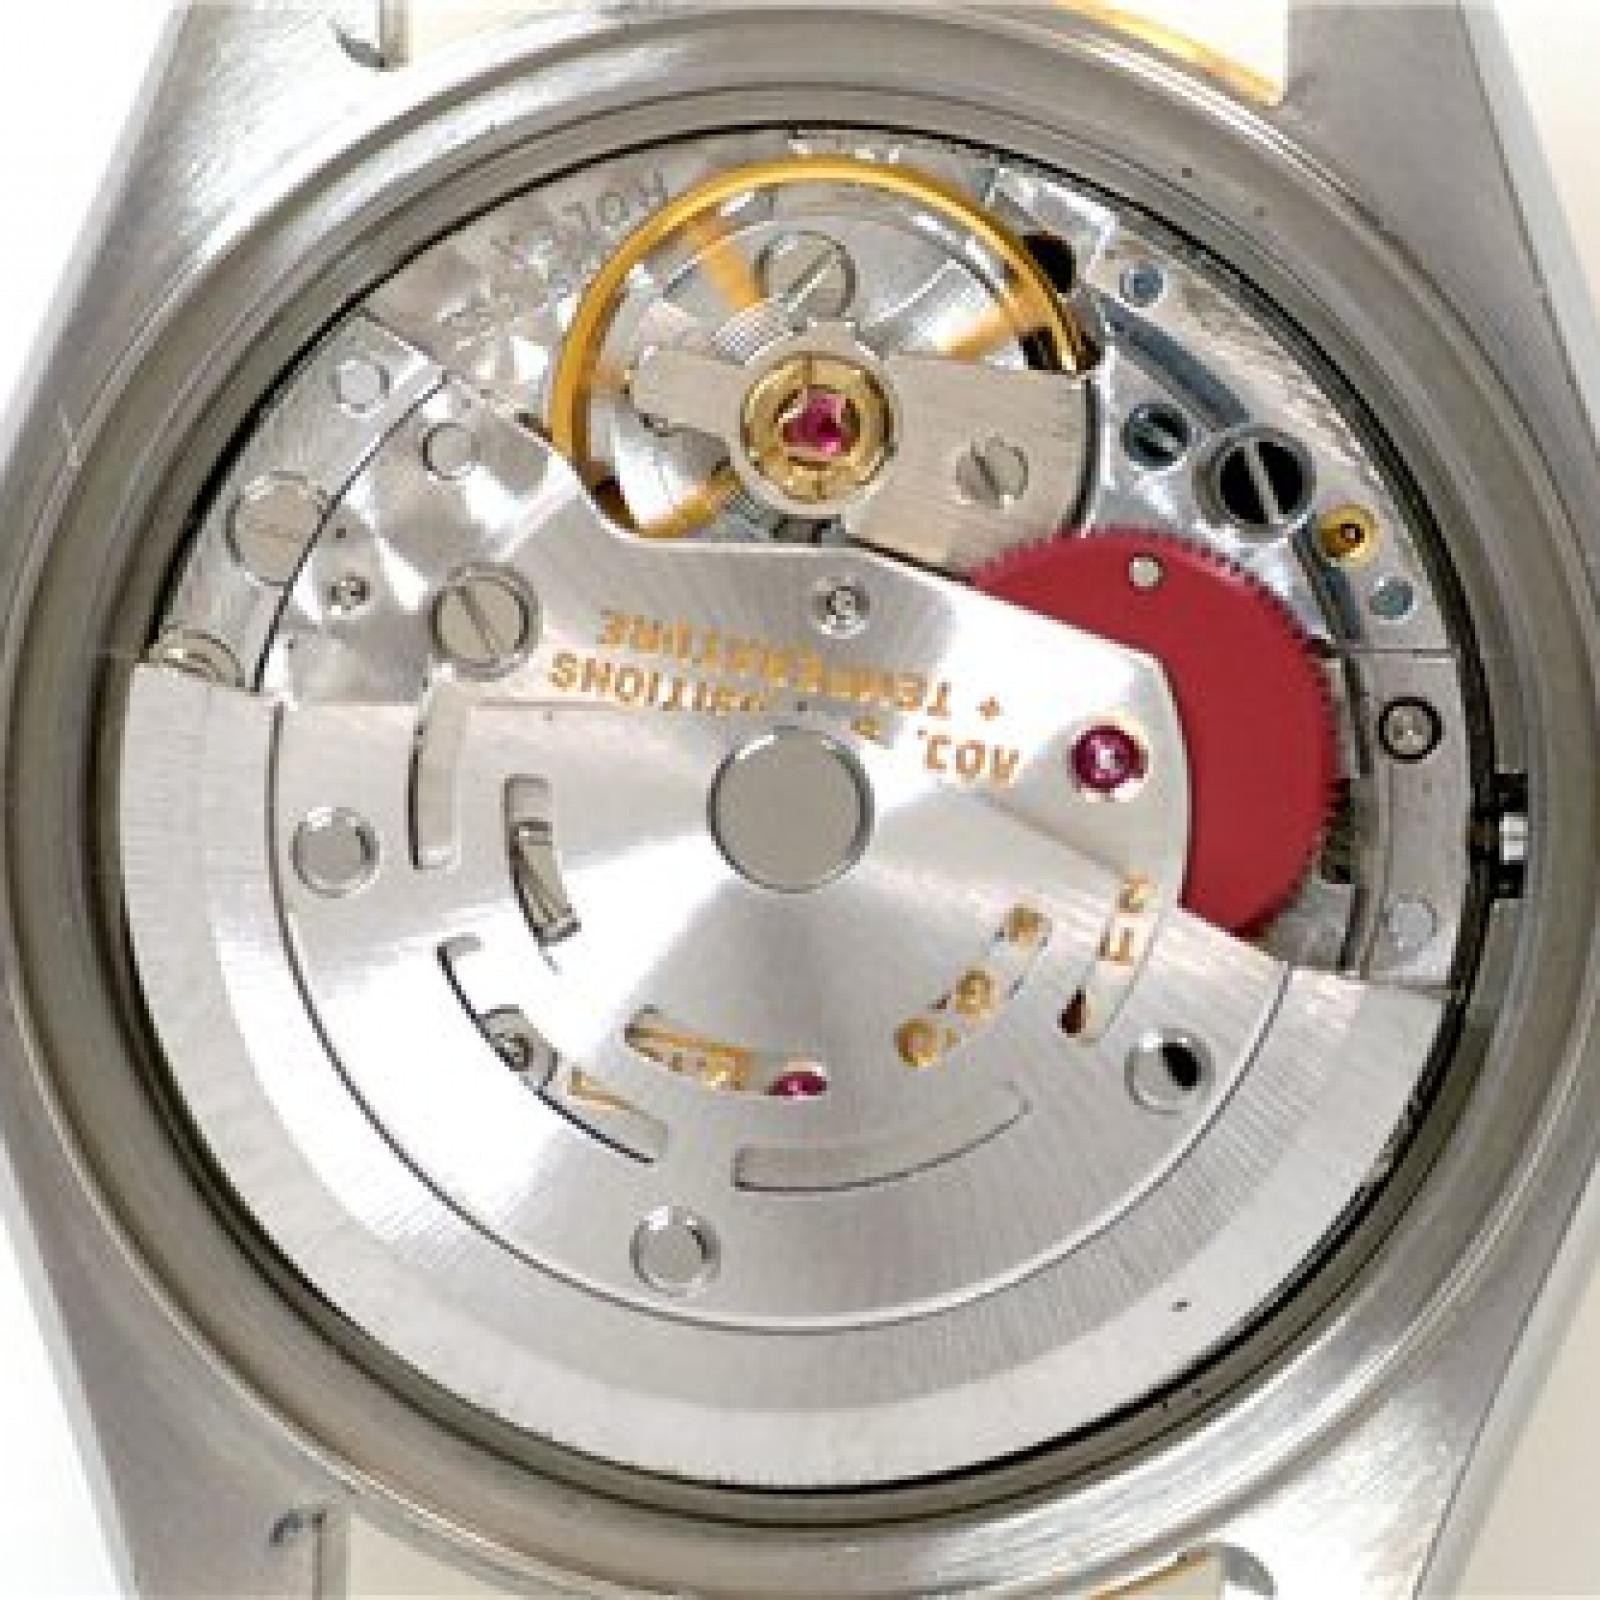 Rolex Datejust 69173 Gold & Steel Black